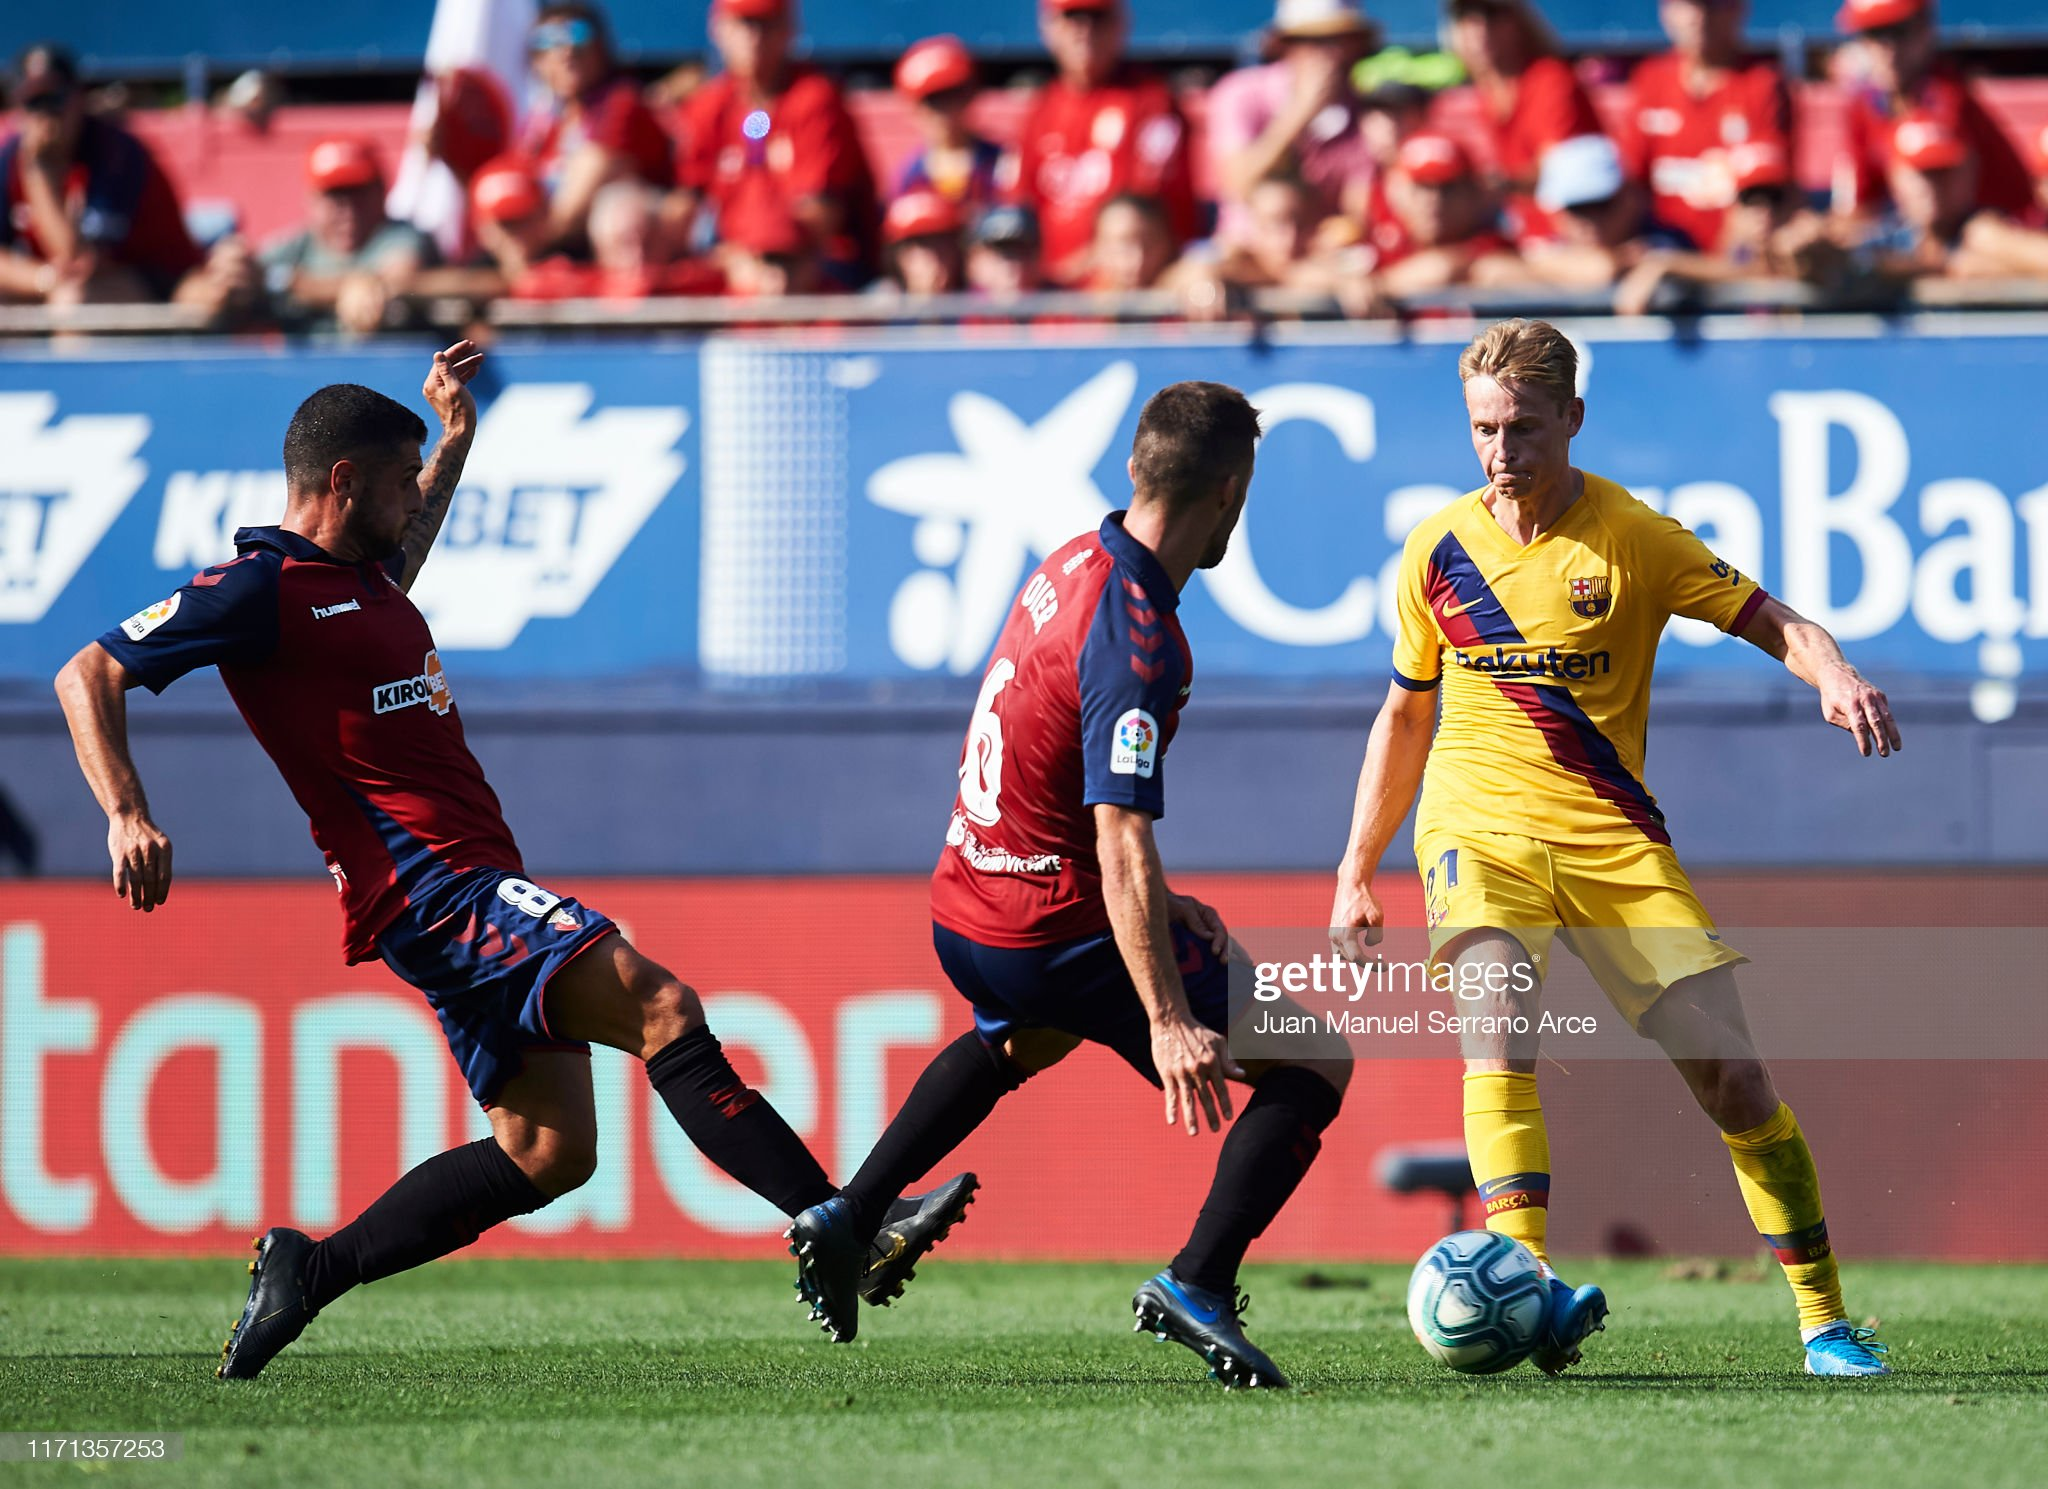 صور مباراة : أوساسونا - برشلونة 2-2 ( 31-08-2019 )  Fran-merida-of-ca-osasuna-competes-for-the-ball-with-frenkie-de-jong-picture-id1171357253?s=2048x2048